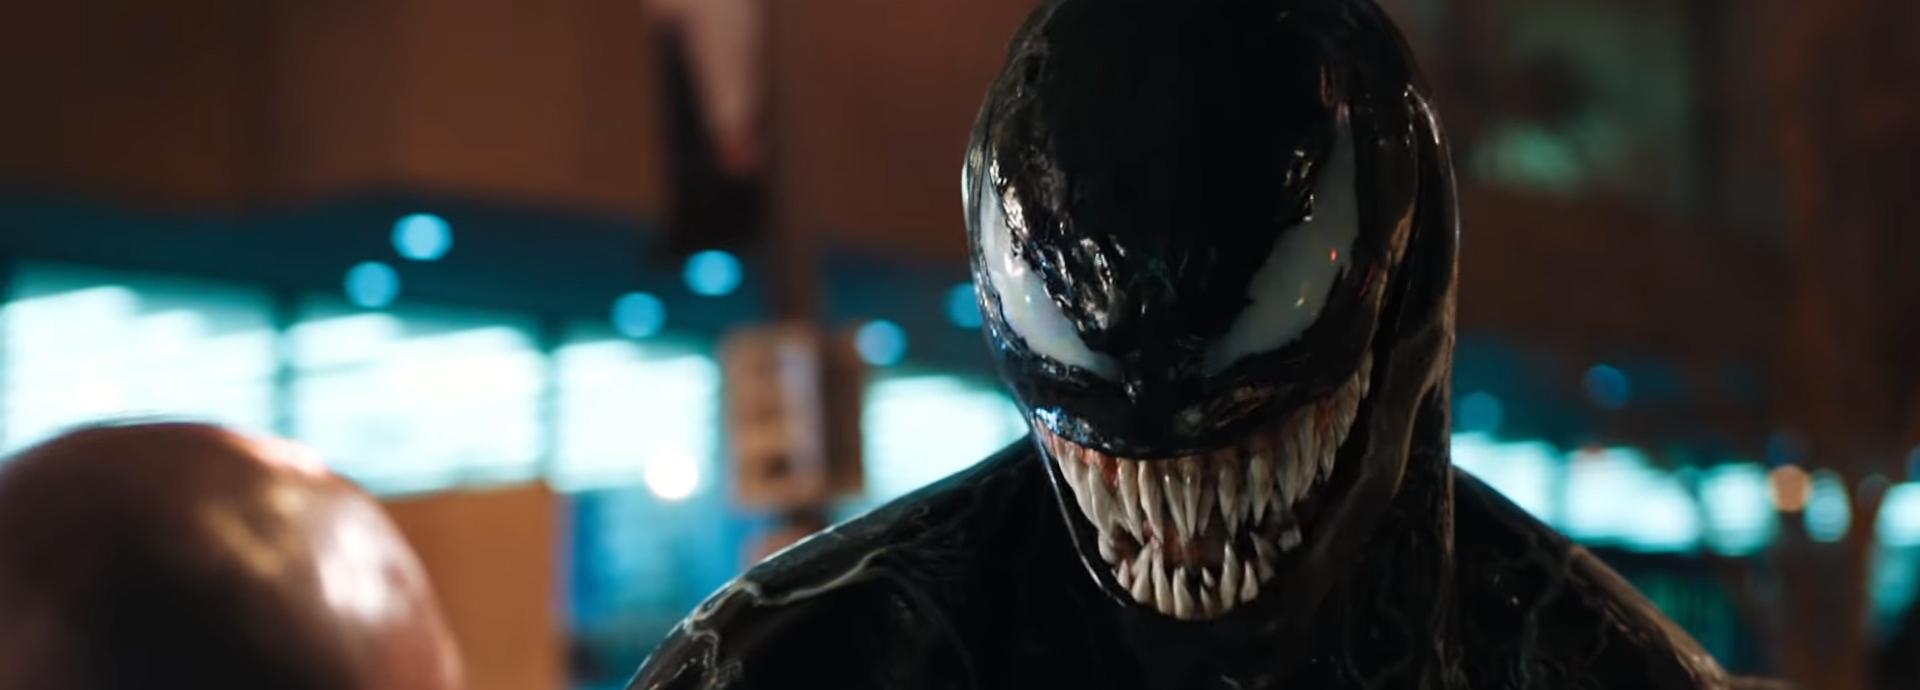 Venom. Image Credit: Sony.